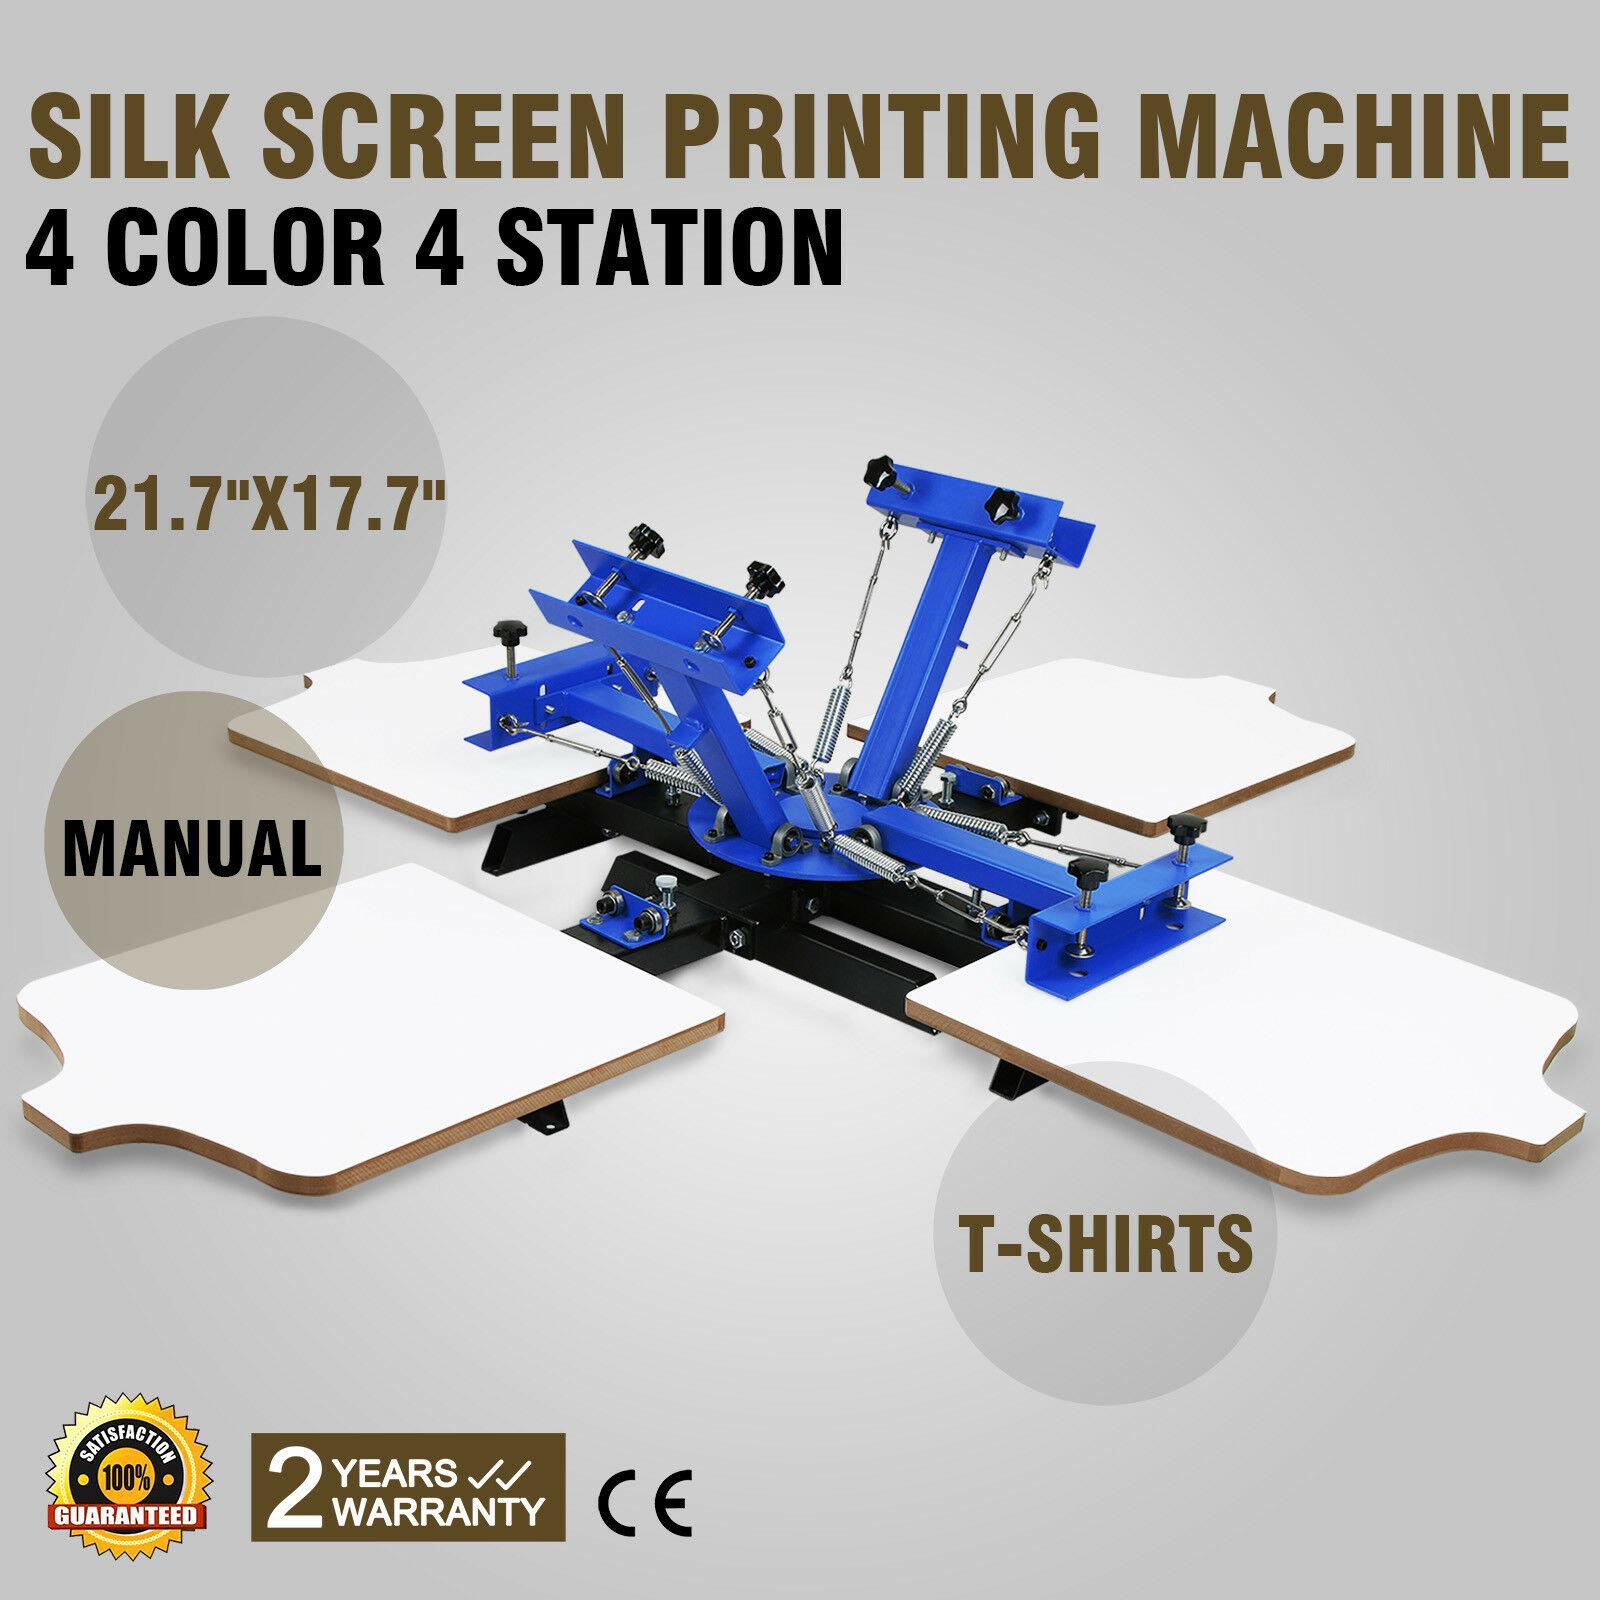 4 Color 4 Station Manual Silk Screen Printing Machine Highly Durable T-Shirt Printer Pressing GREAT